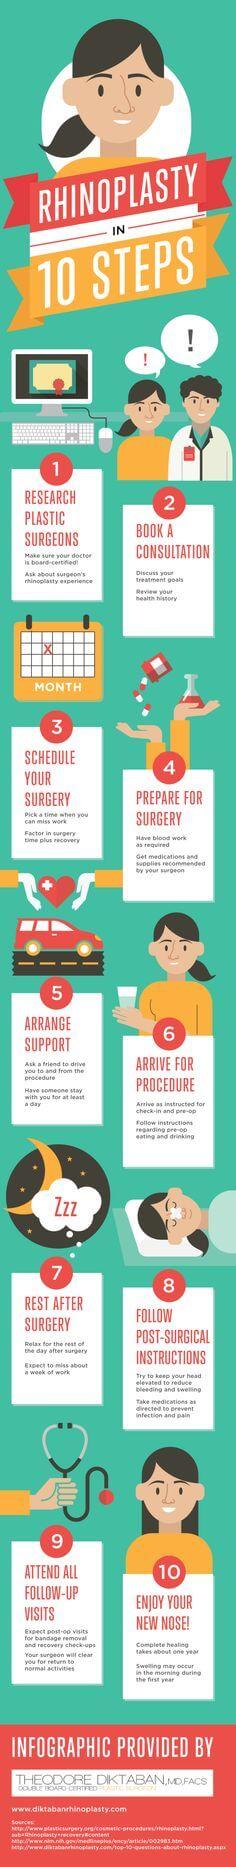 Paso a paso de un procedimiento de rinoplastia #infografia